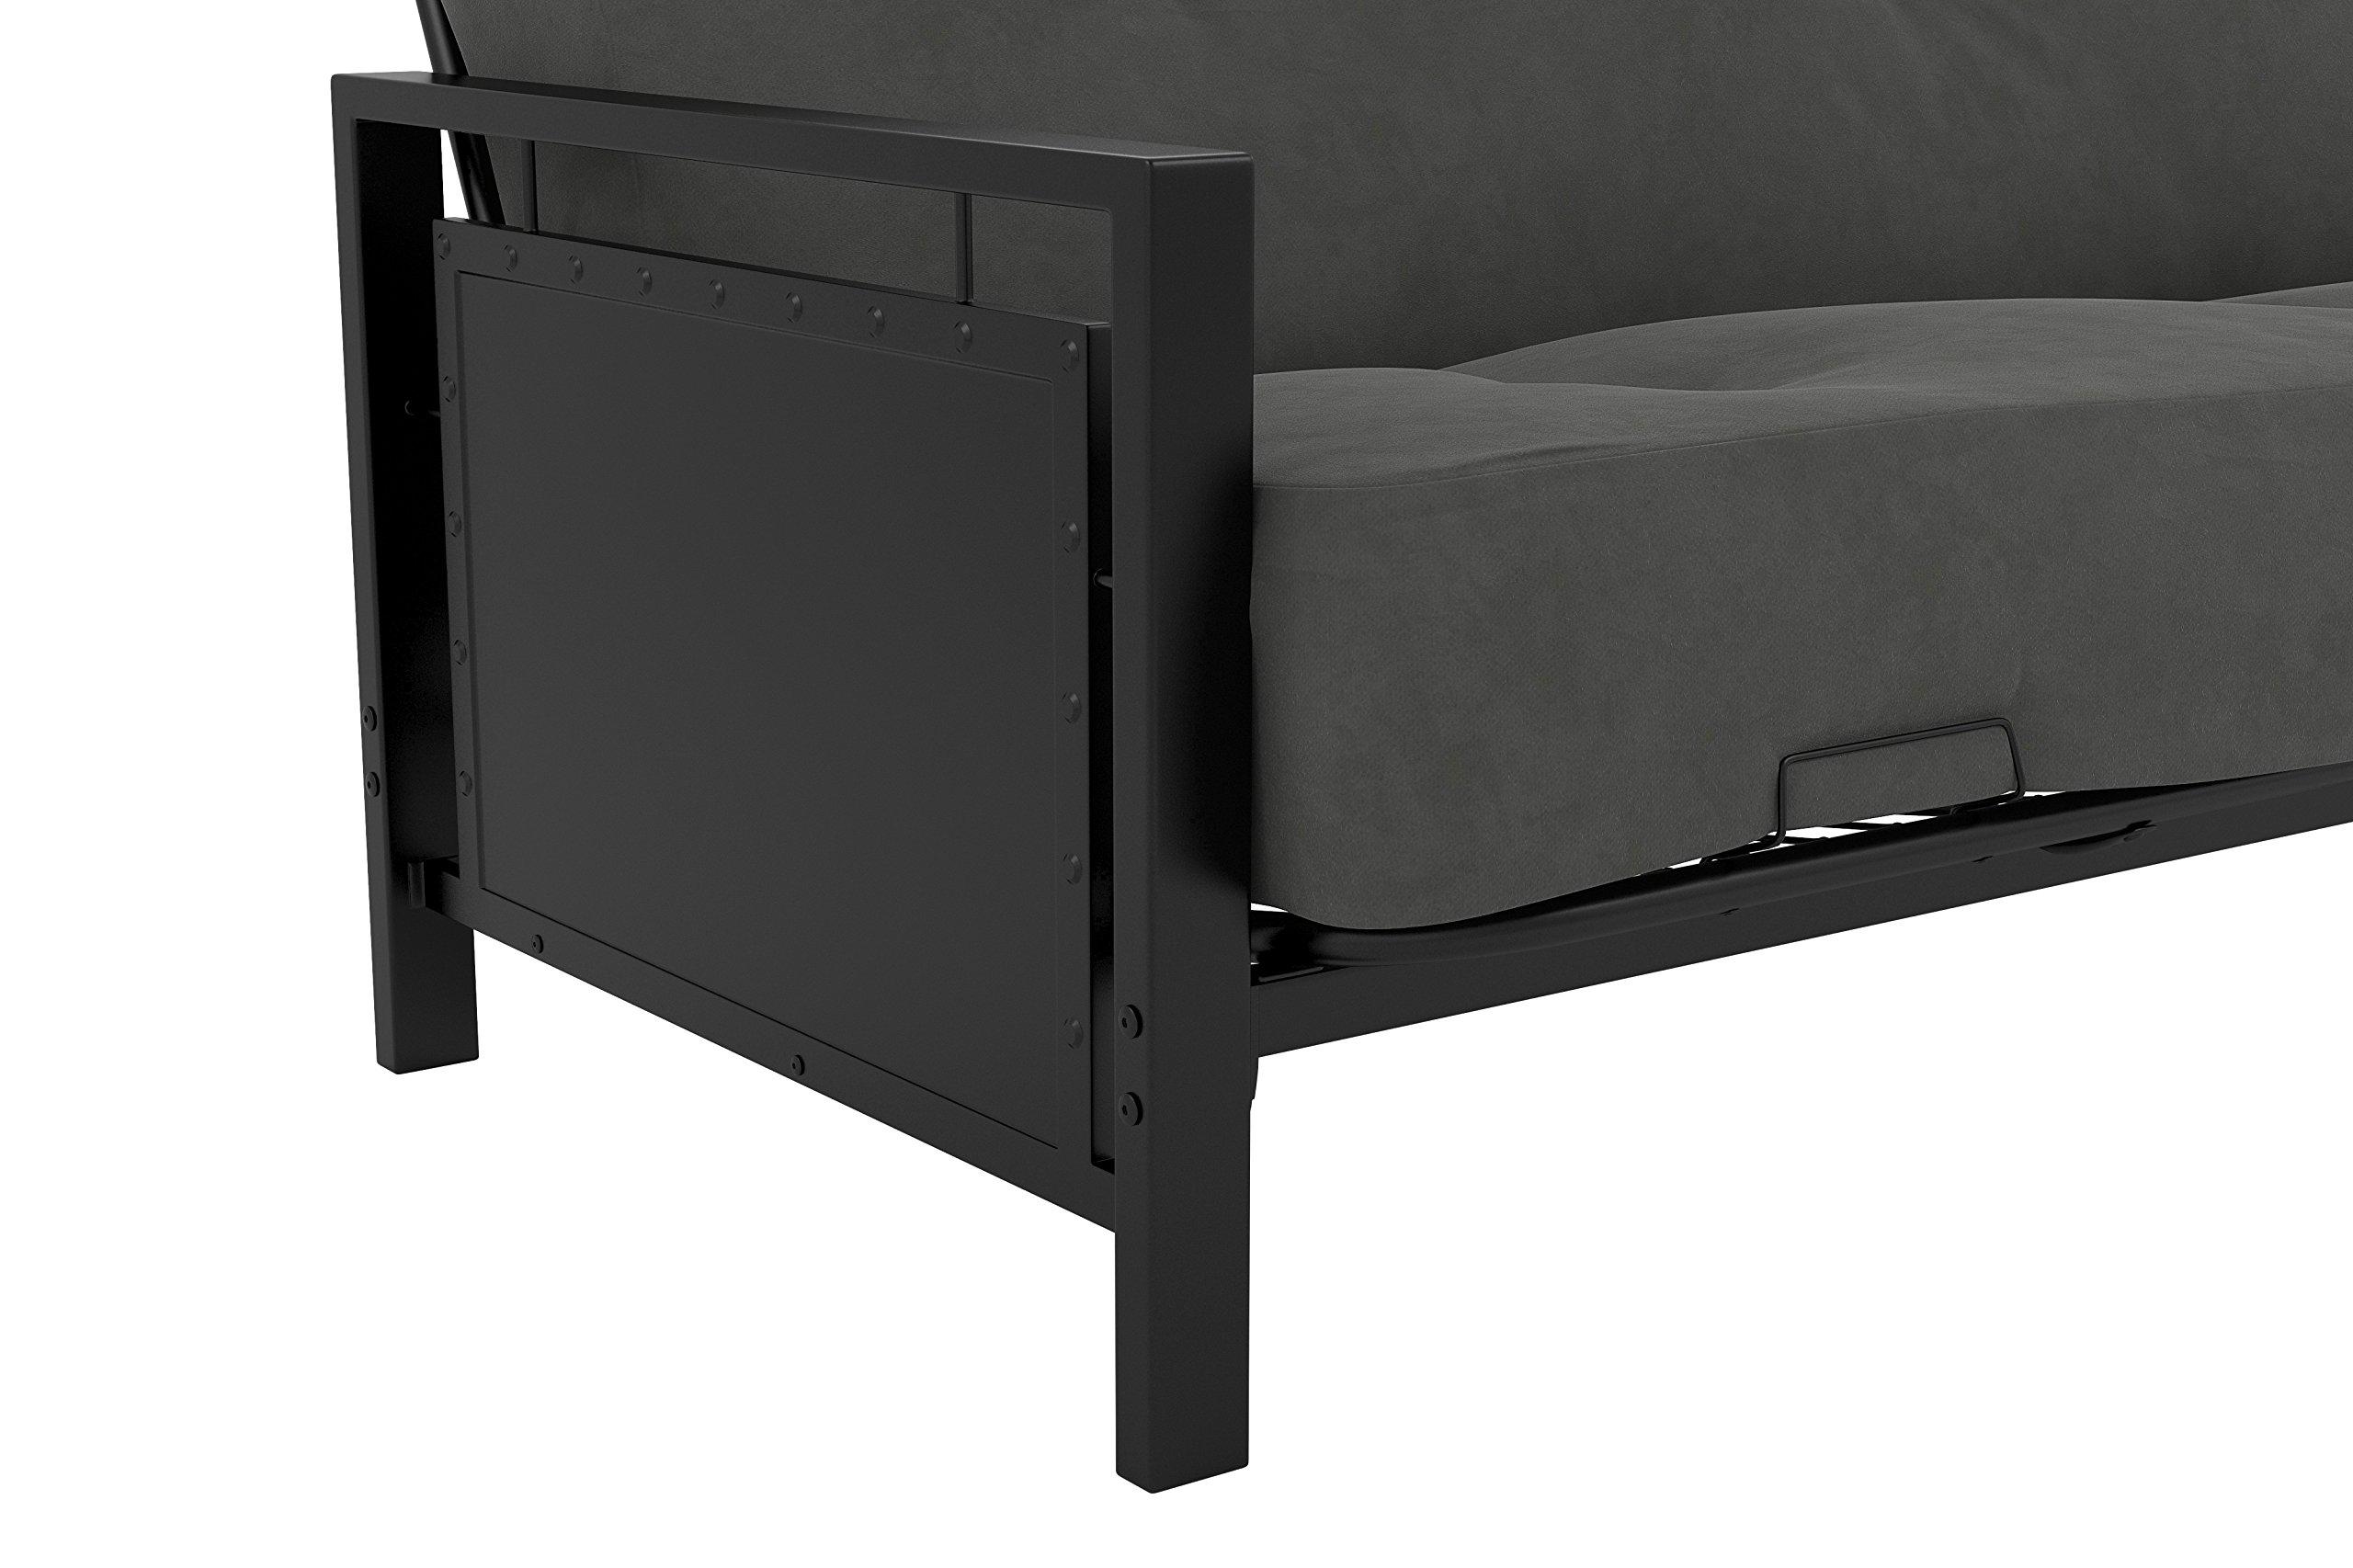 DHP Henley Metal Arm Futon Frame, Industrial Loft Design, Converts to Sleeper, Black Sturdy Metal by DHP (Image #8)